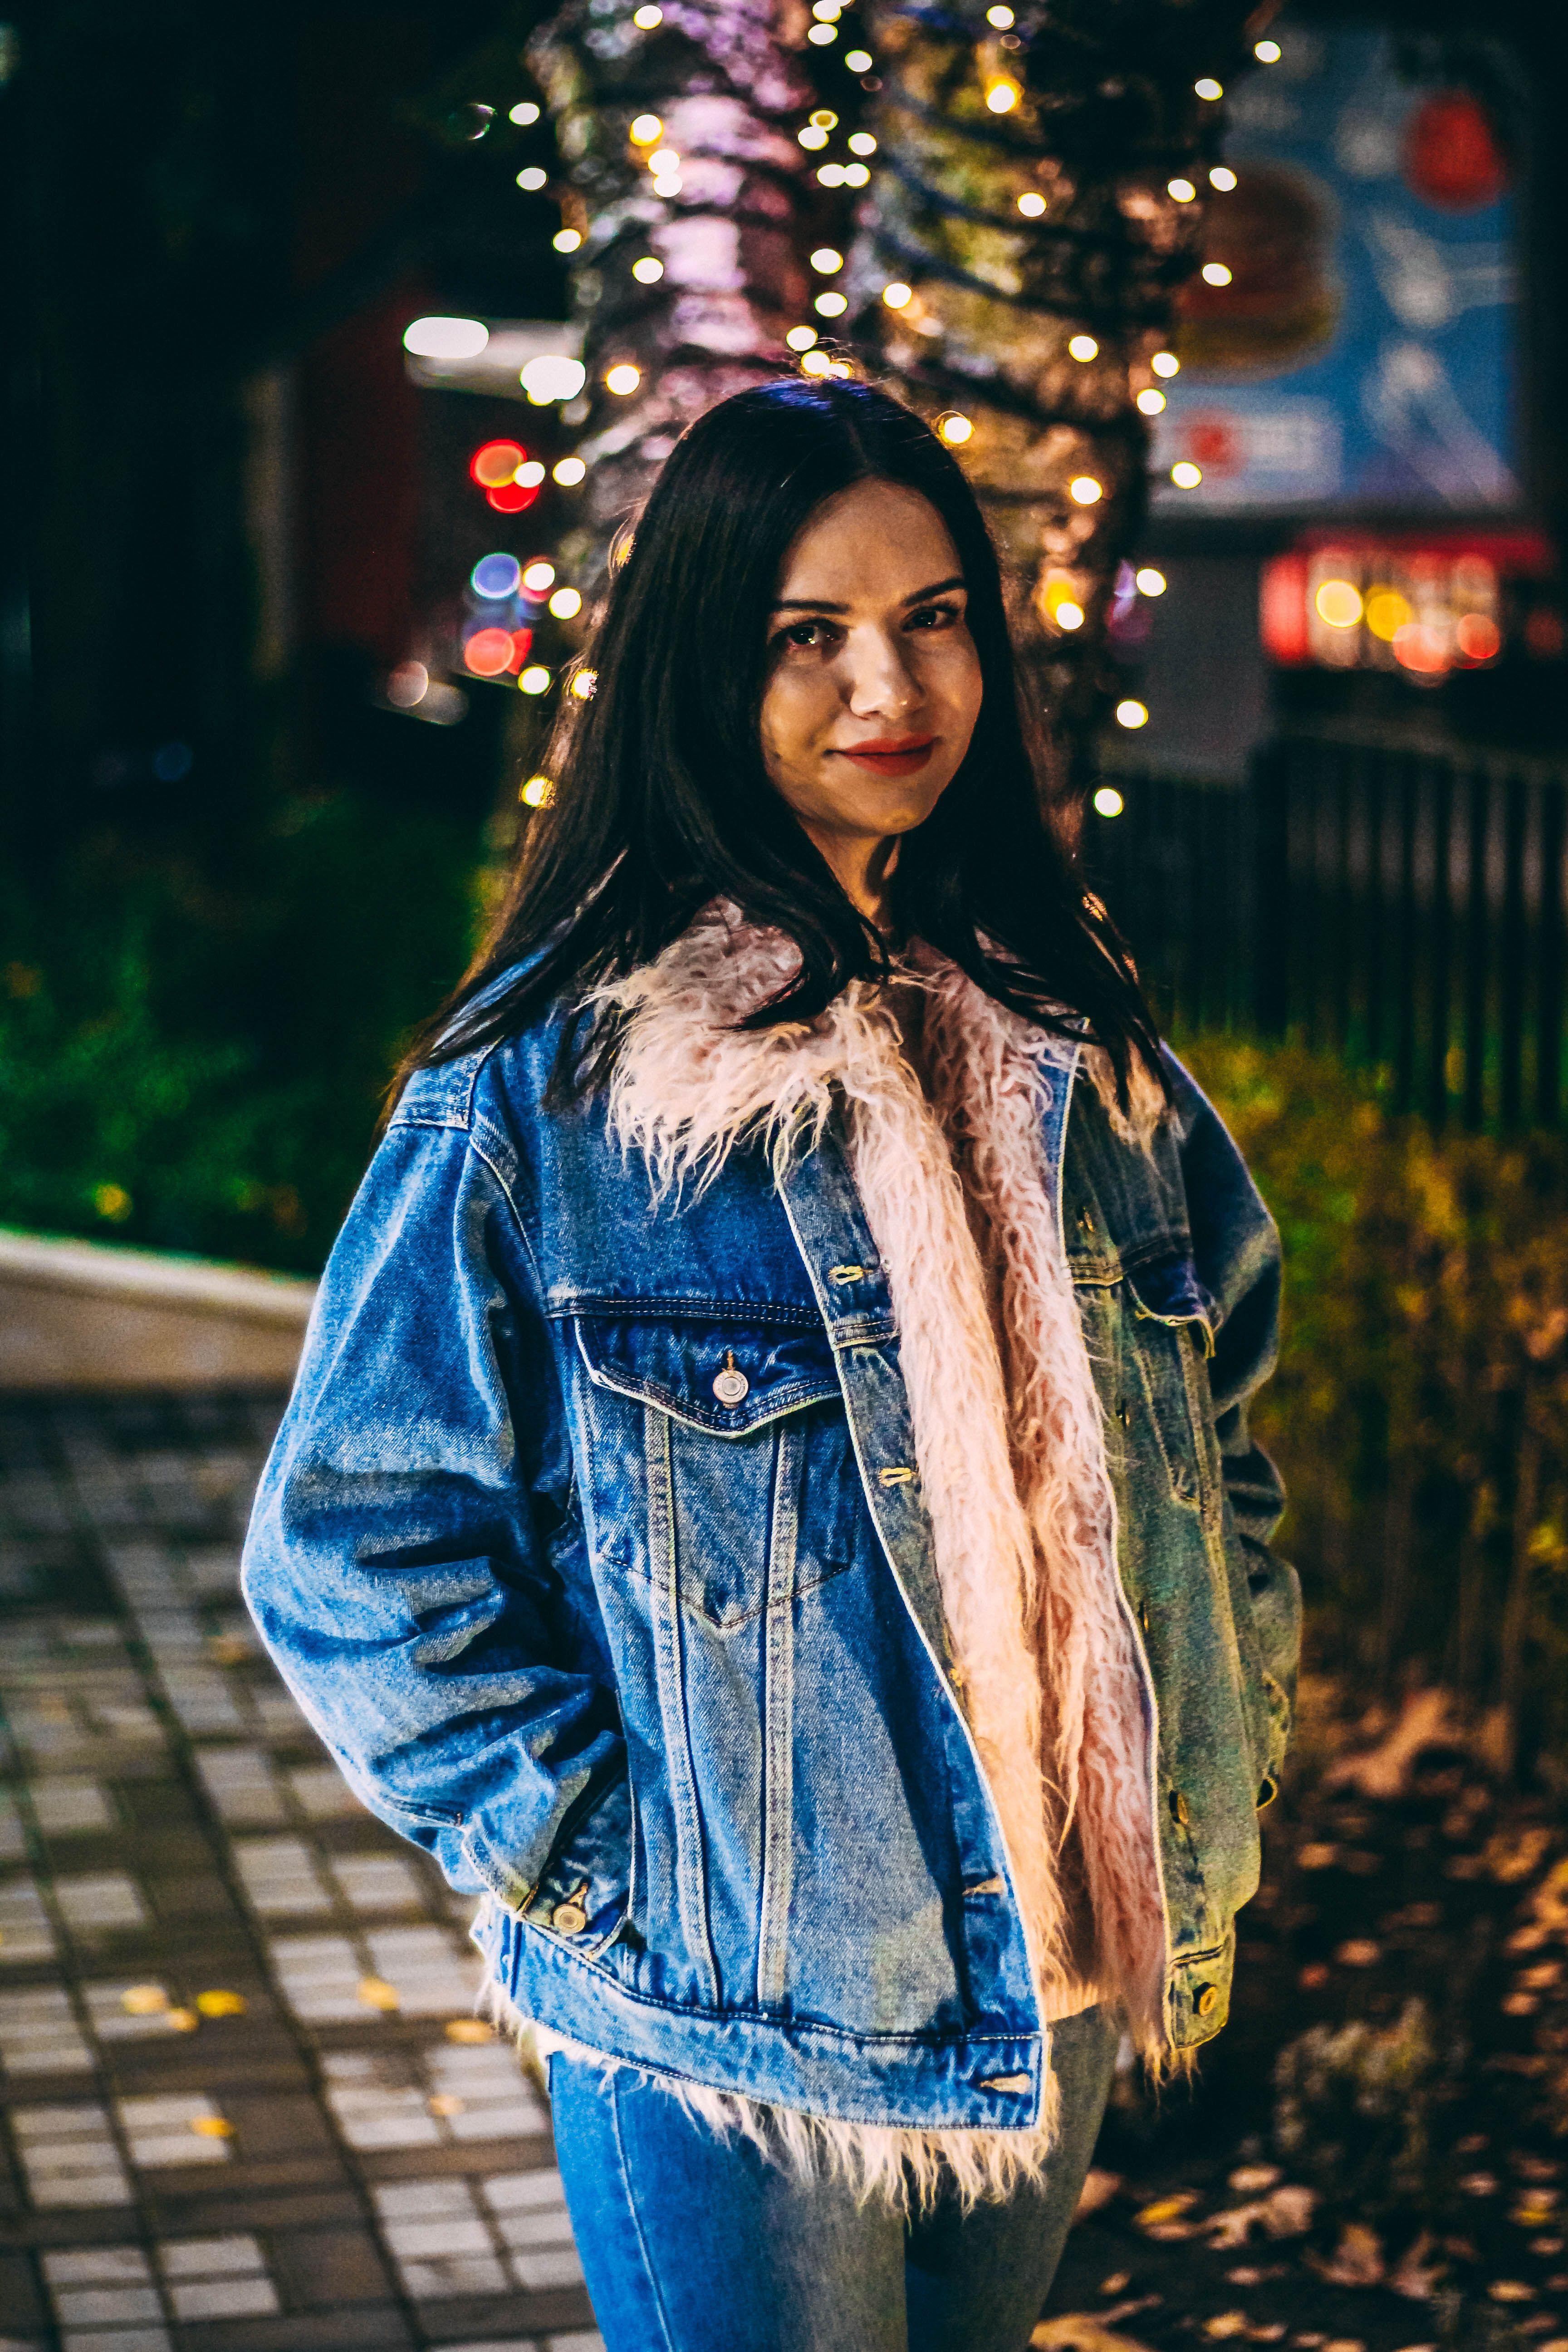 Winter Denim Jacket With Pink Faux Fur Denim Outerwear Denimjacket Denimstyle Fauxfur Fauxfurjacket Bersh Denim Jacket Winter Denim Fashion Steet Style [ 5184 x 3456 Pixel ]